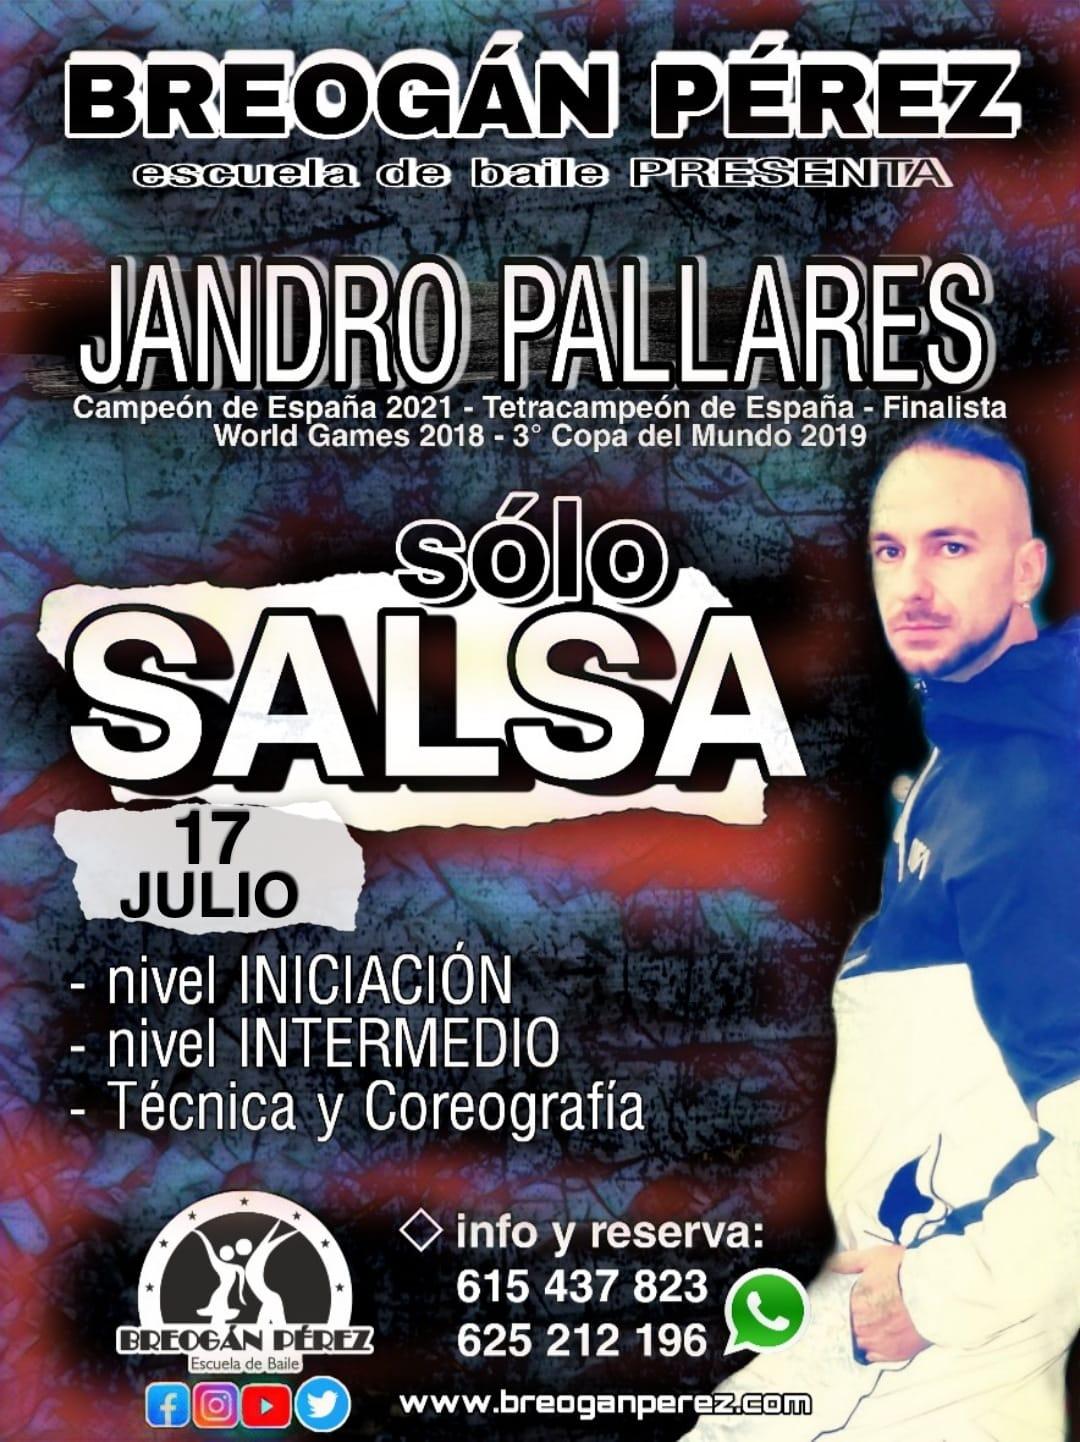 JANDRO PALLARES. TALLER DE SALSA